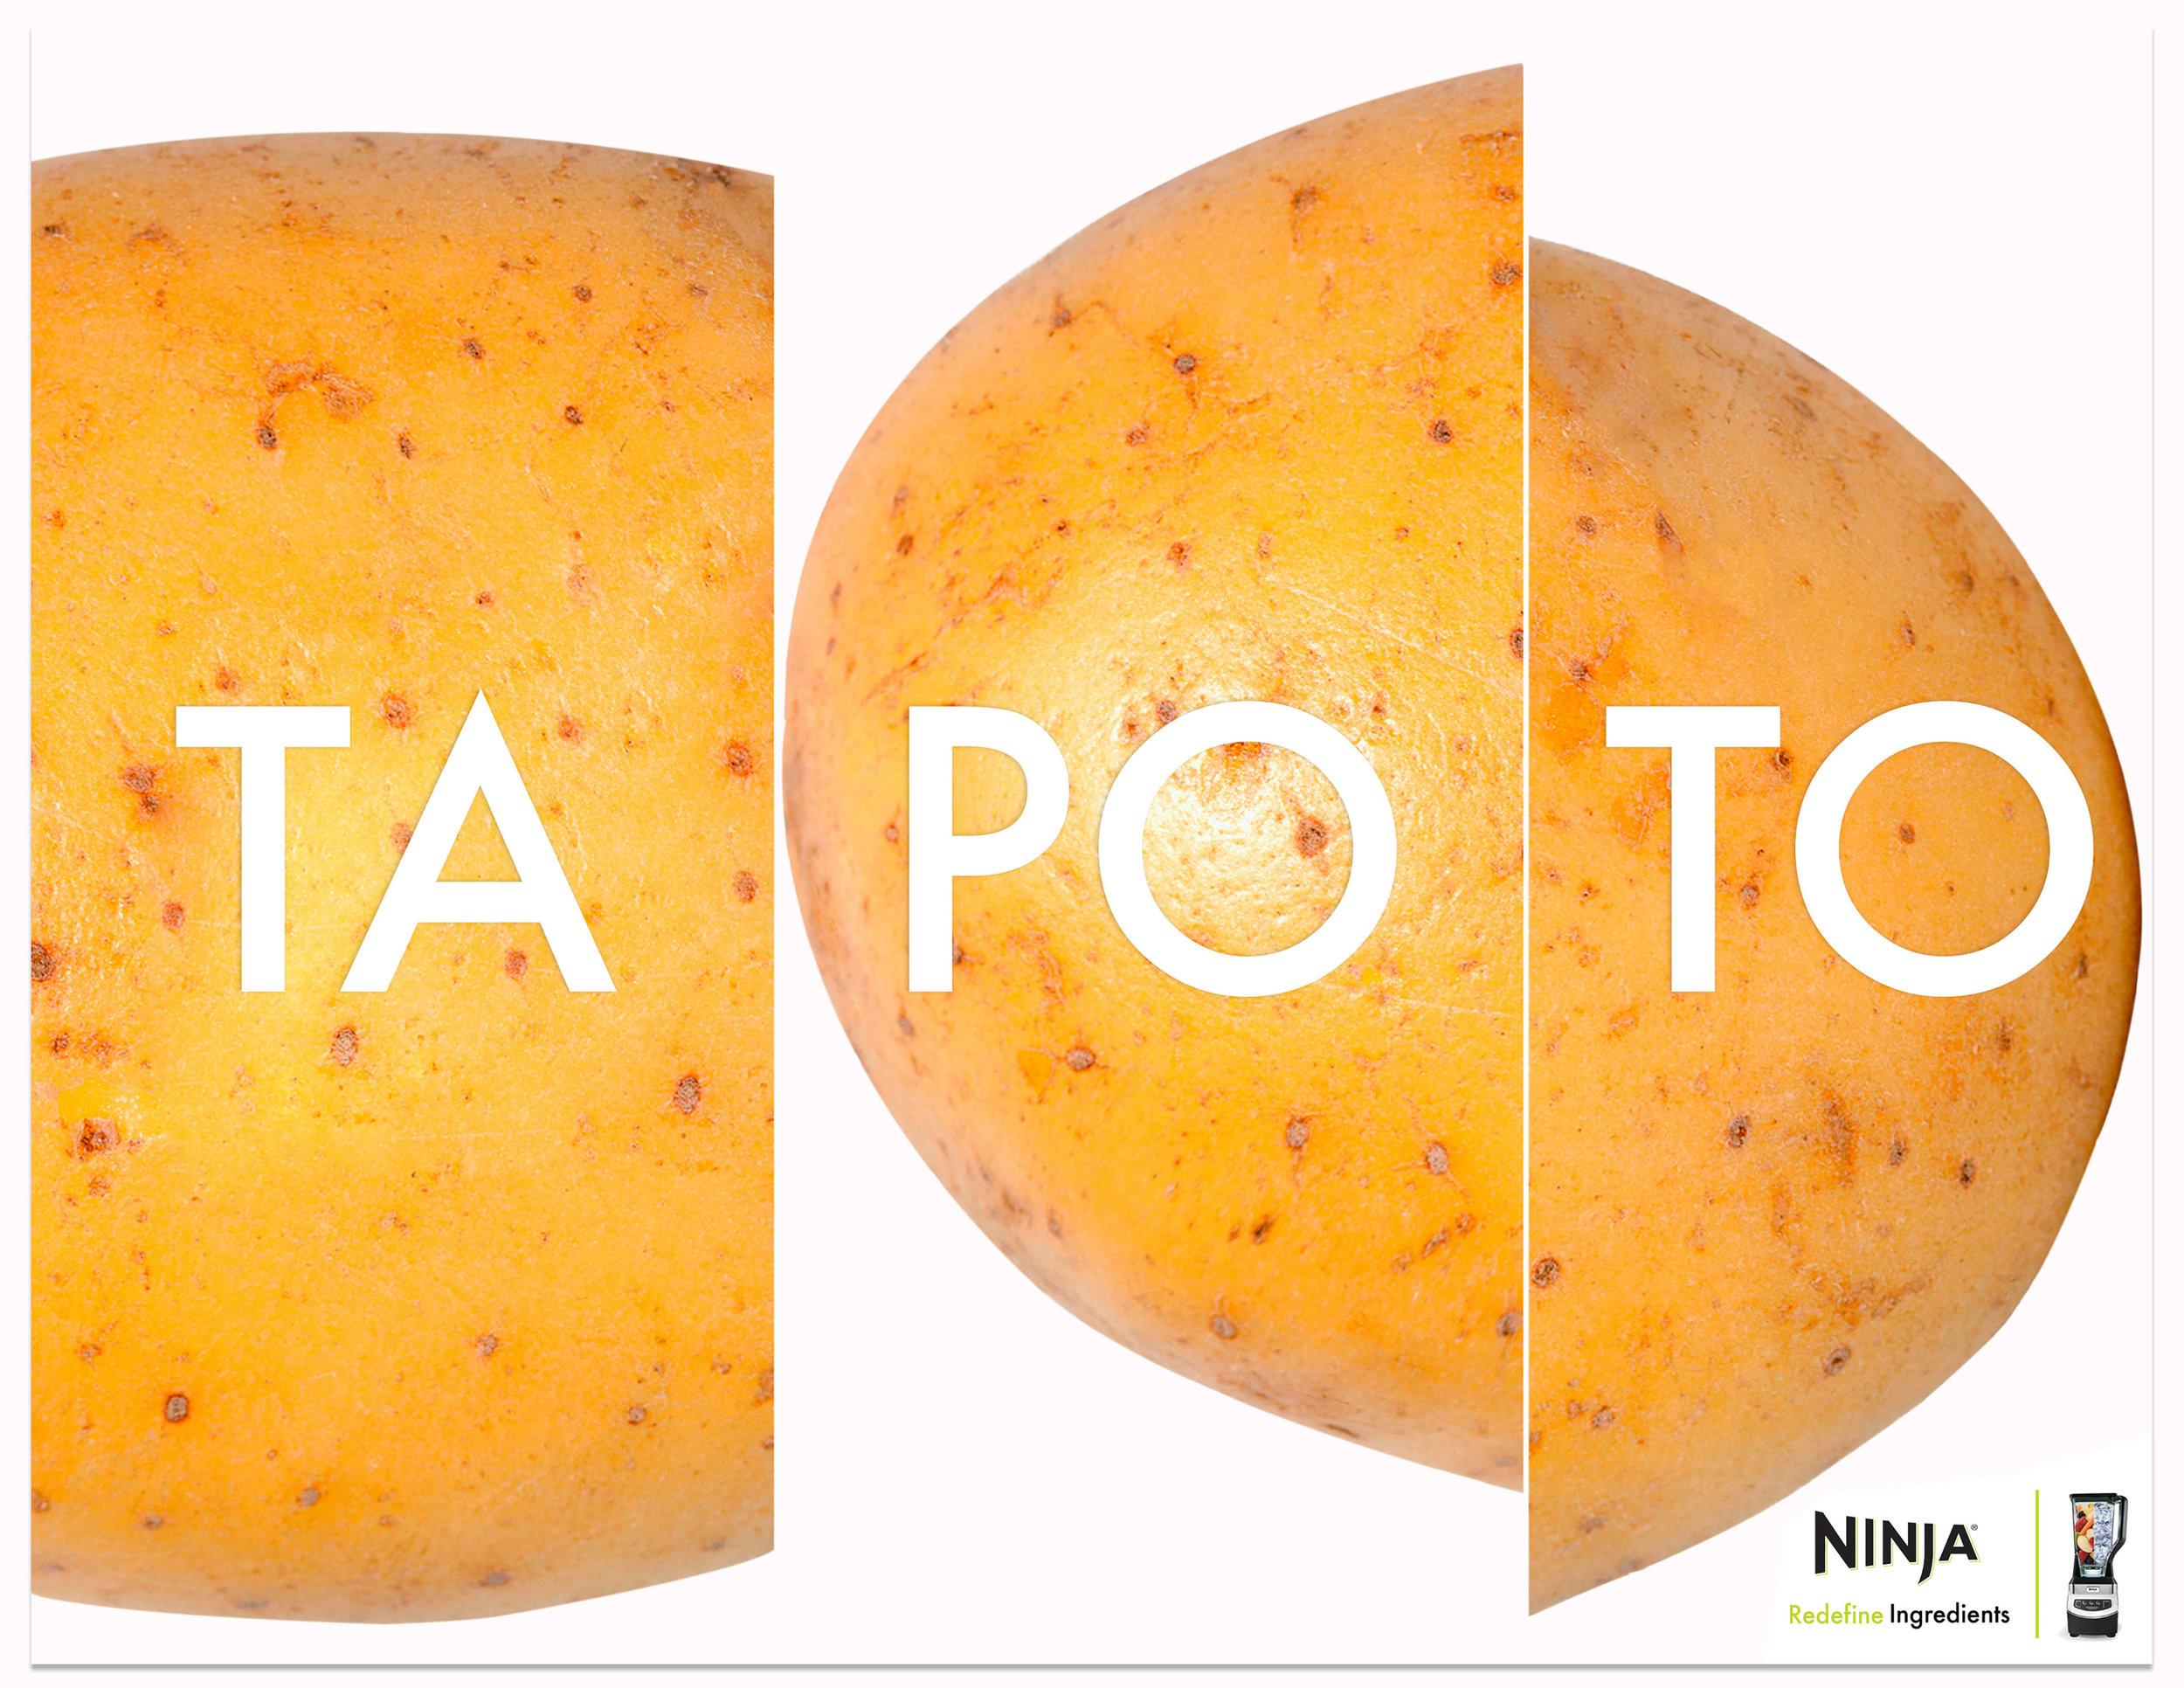 NINJA|Redefine|POTATO|HD2.jpg